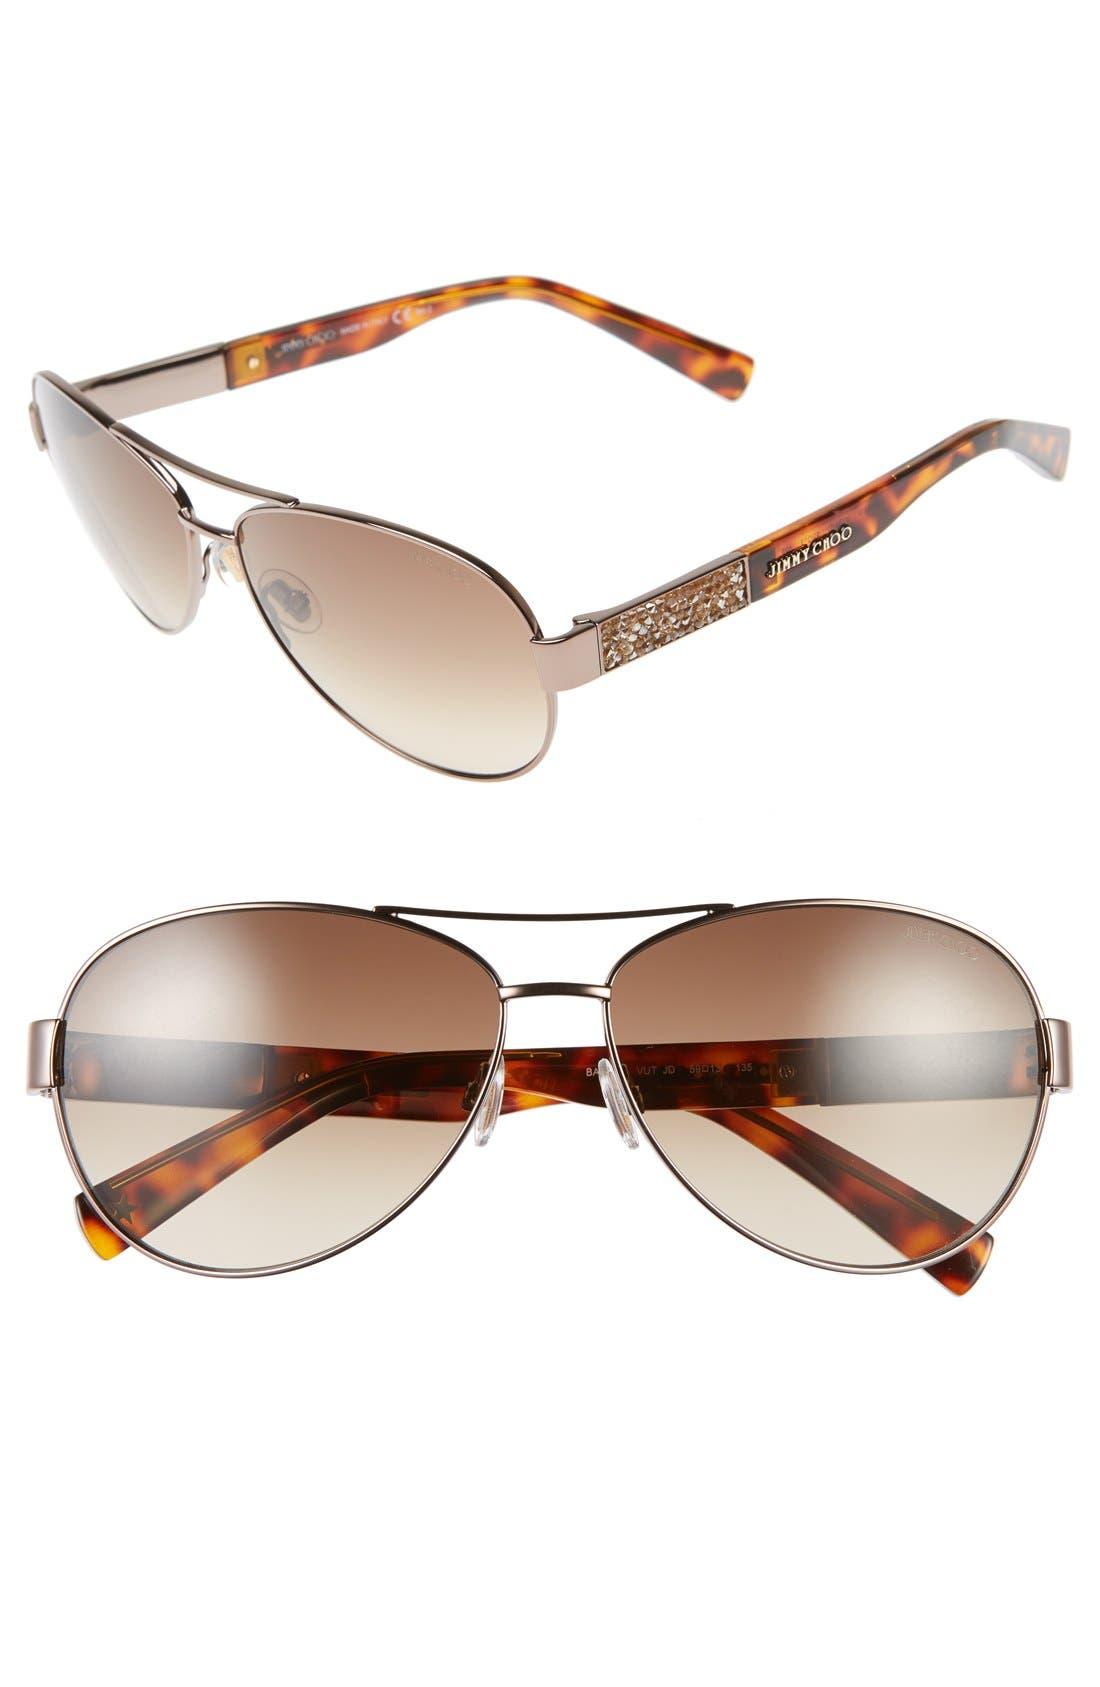 JIMMY CHOO,                             'Babas' 59mm Aviator Sunglasses,                             Main thumbnail 1, color,                             200